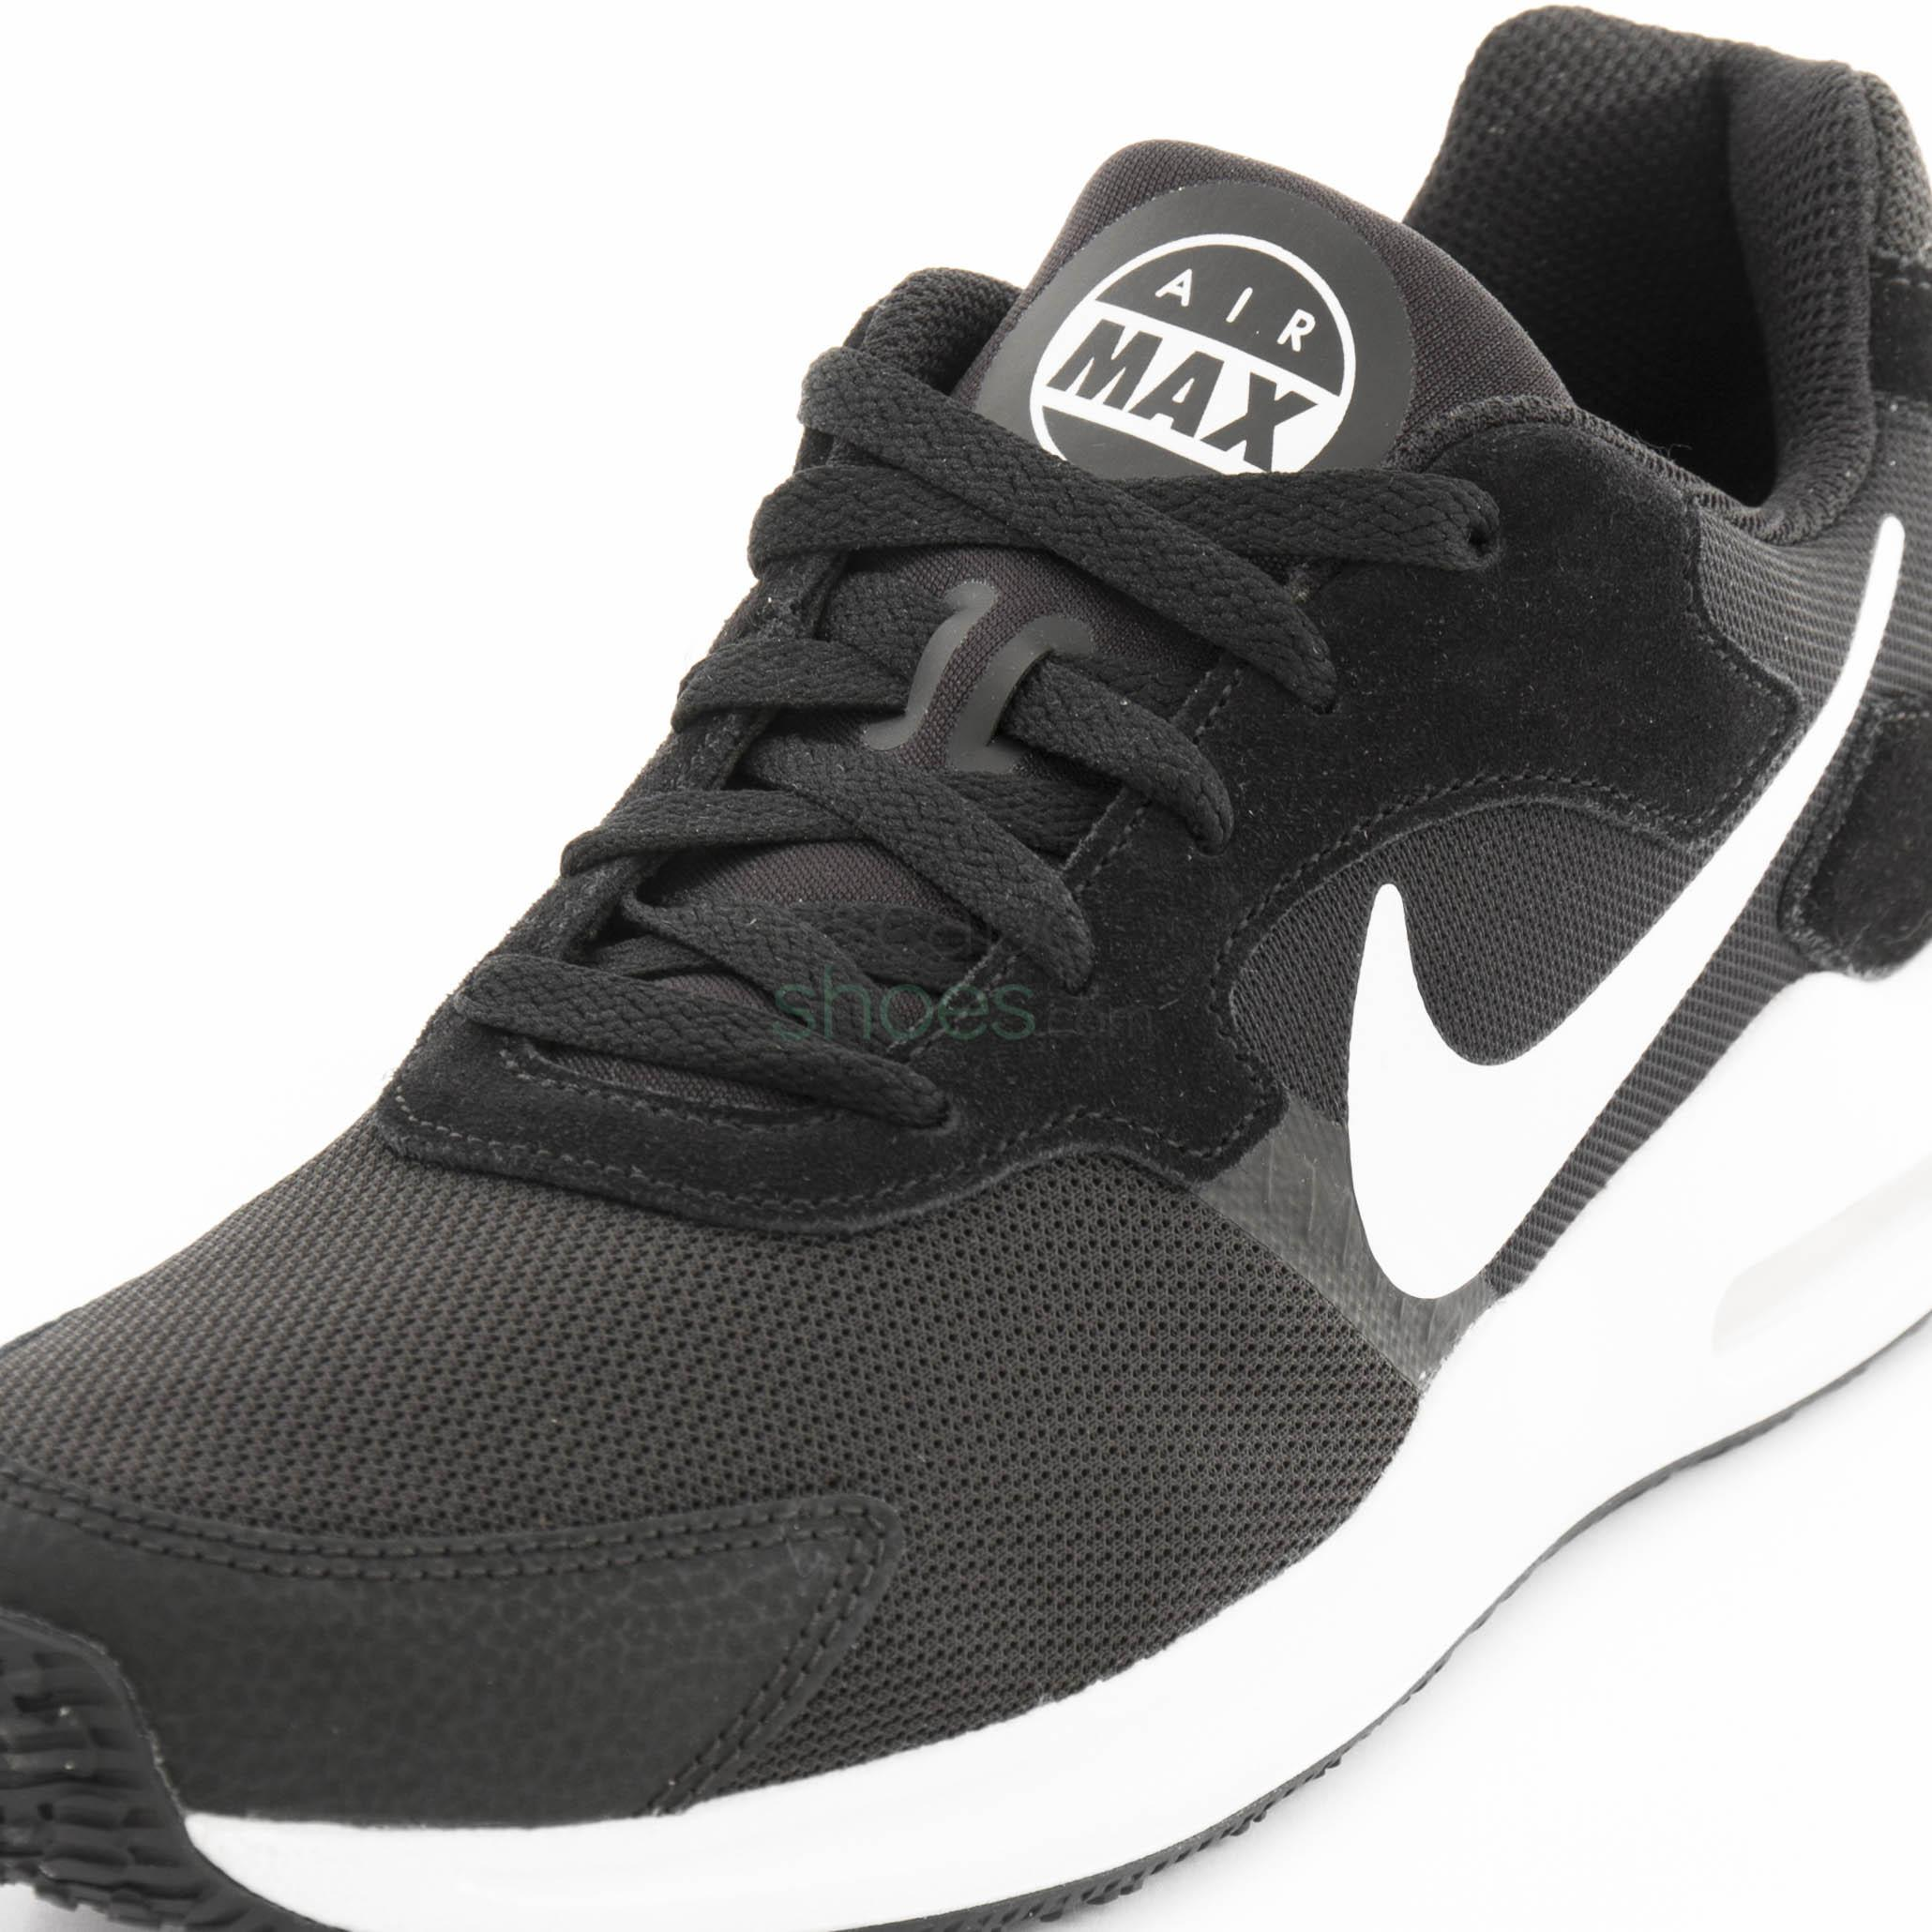 Sneakers NIKE Air Max Guile Black White 916768 004